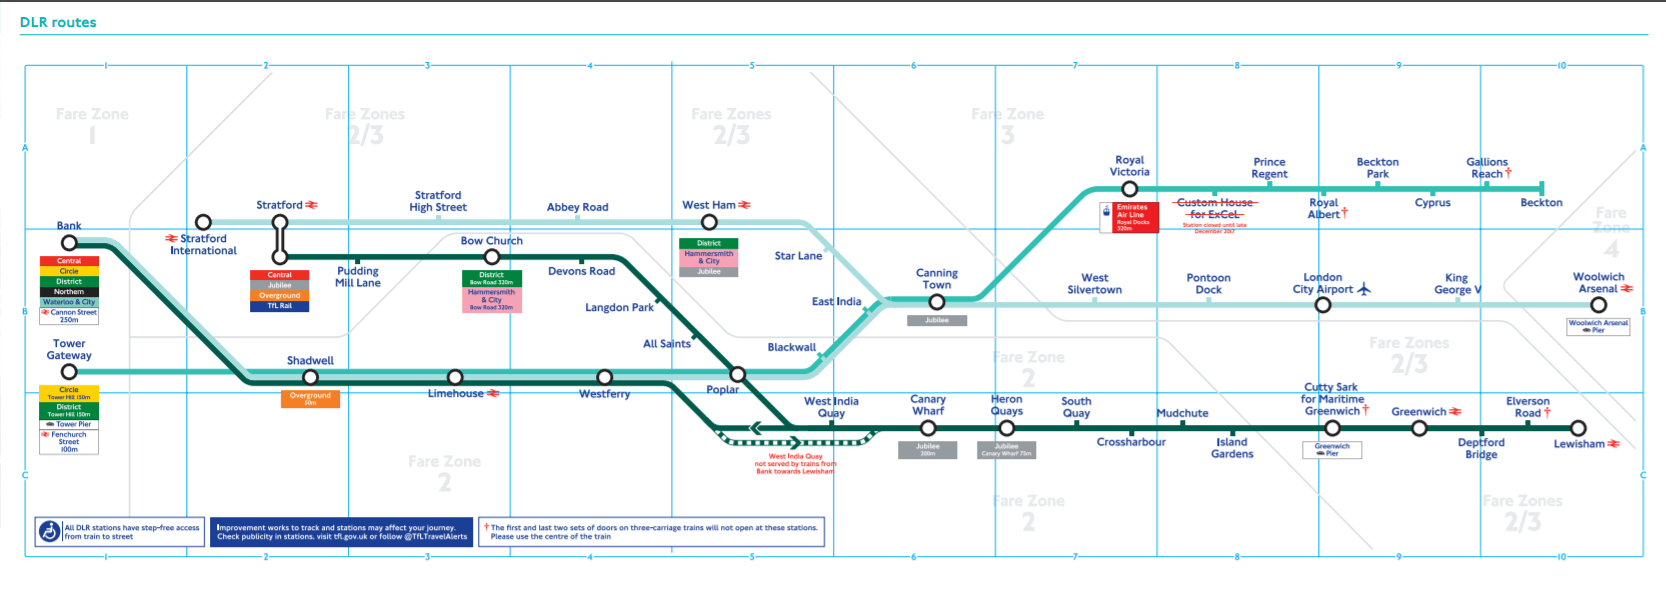 DLR map.